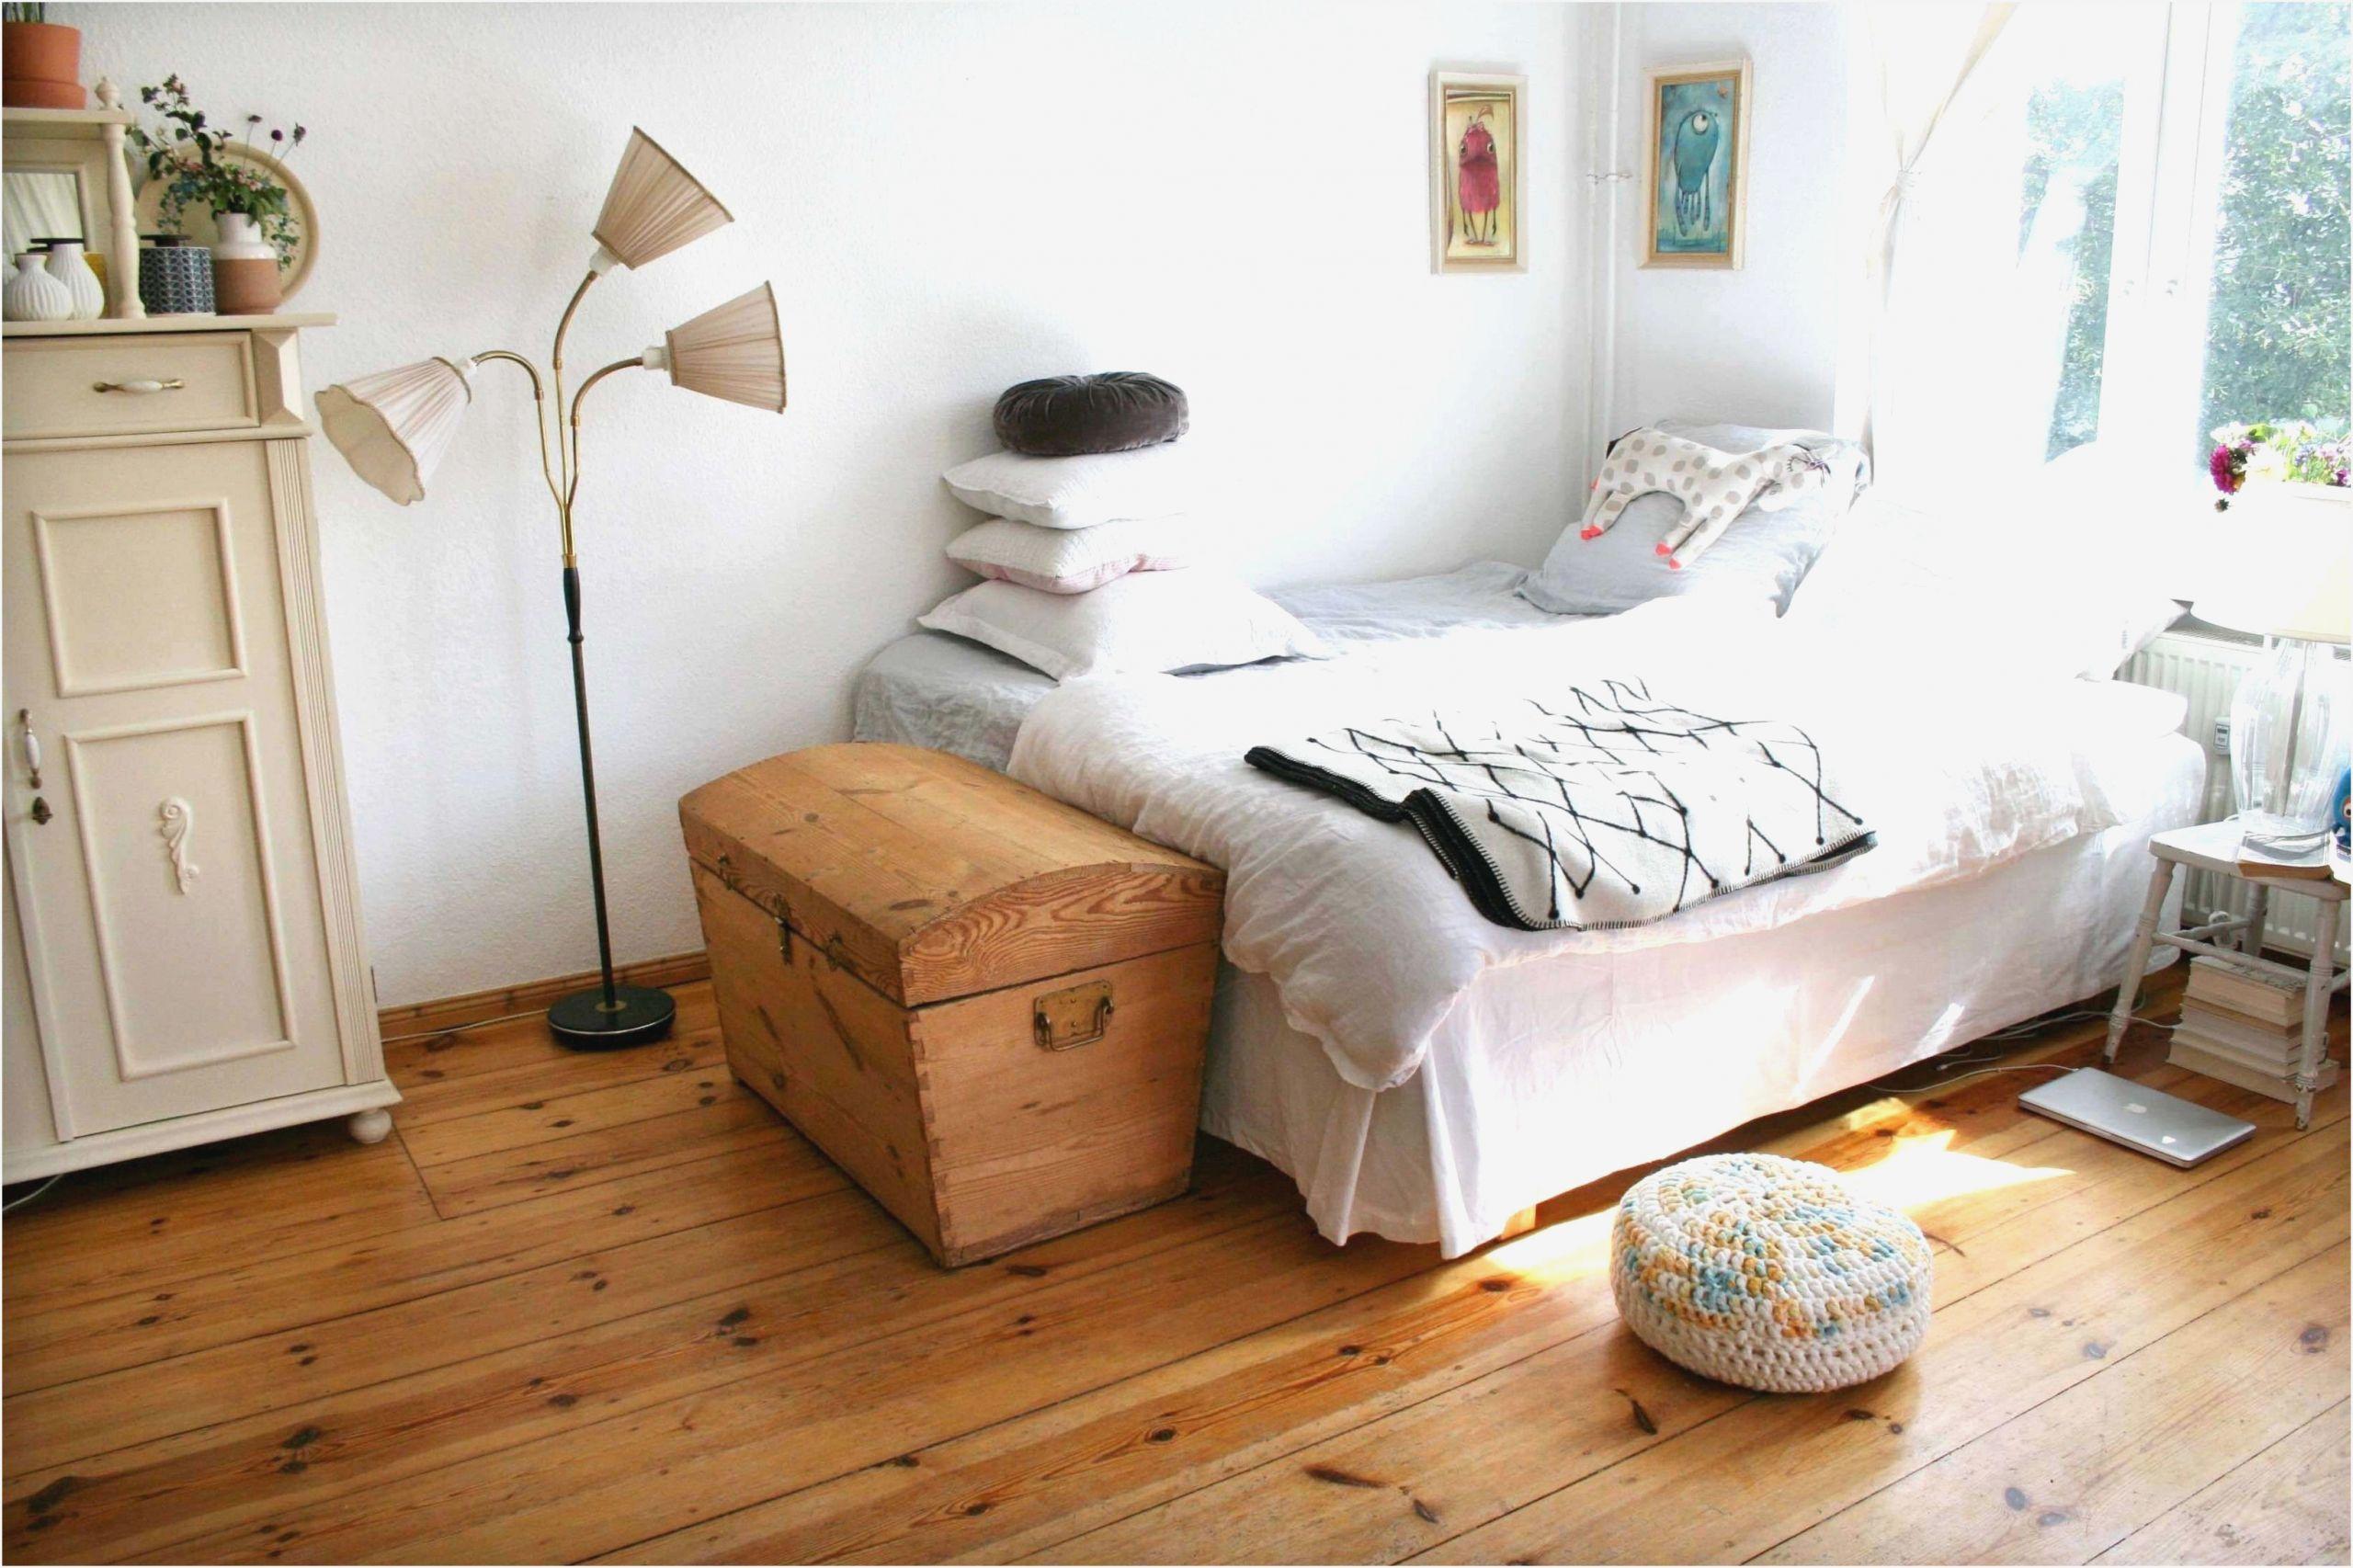 idee wandgestaltung schlafzimmer of idee wandgestaltung schlafzimmer scaled